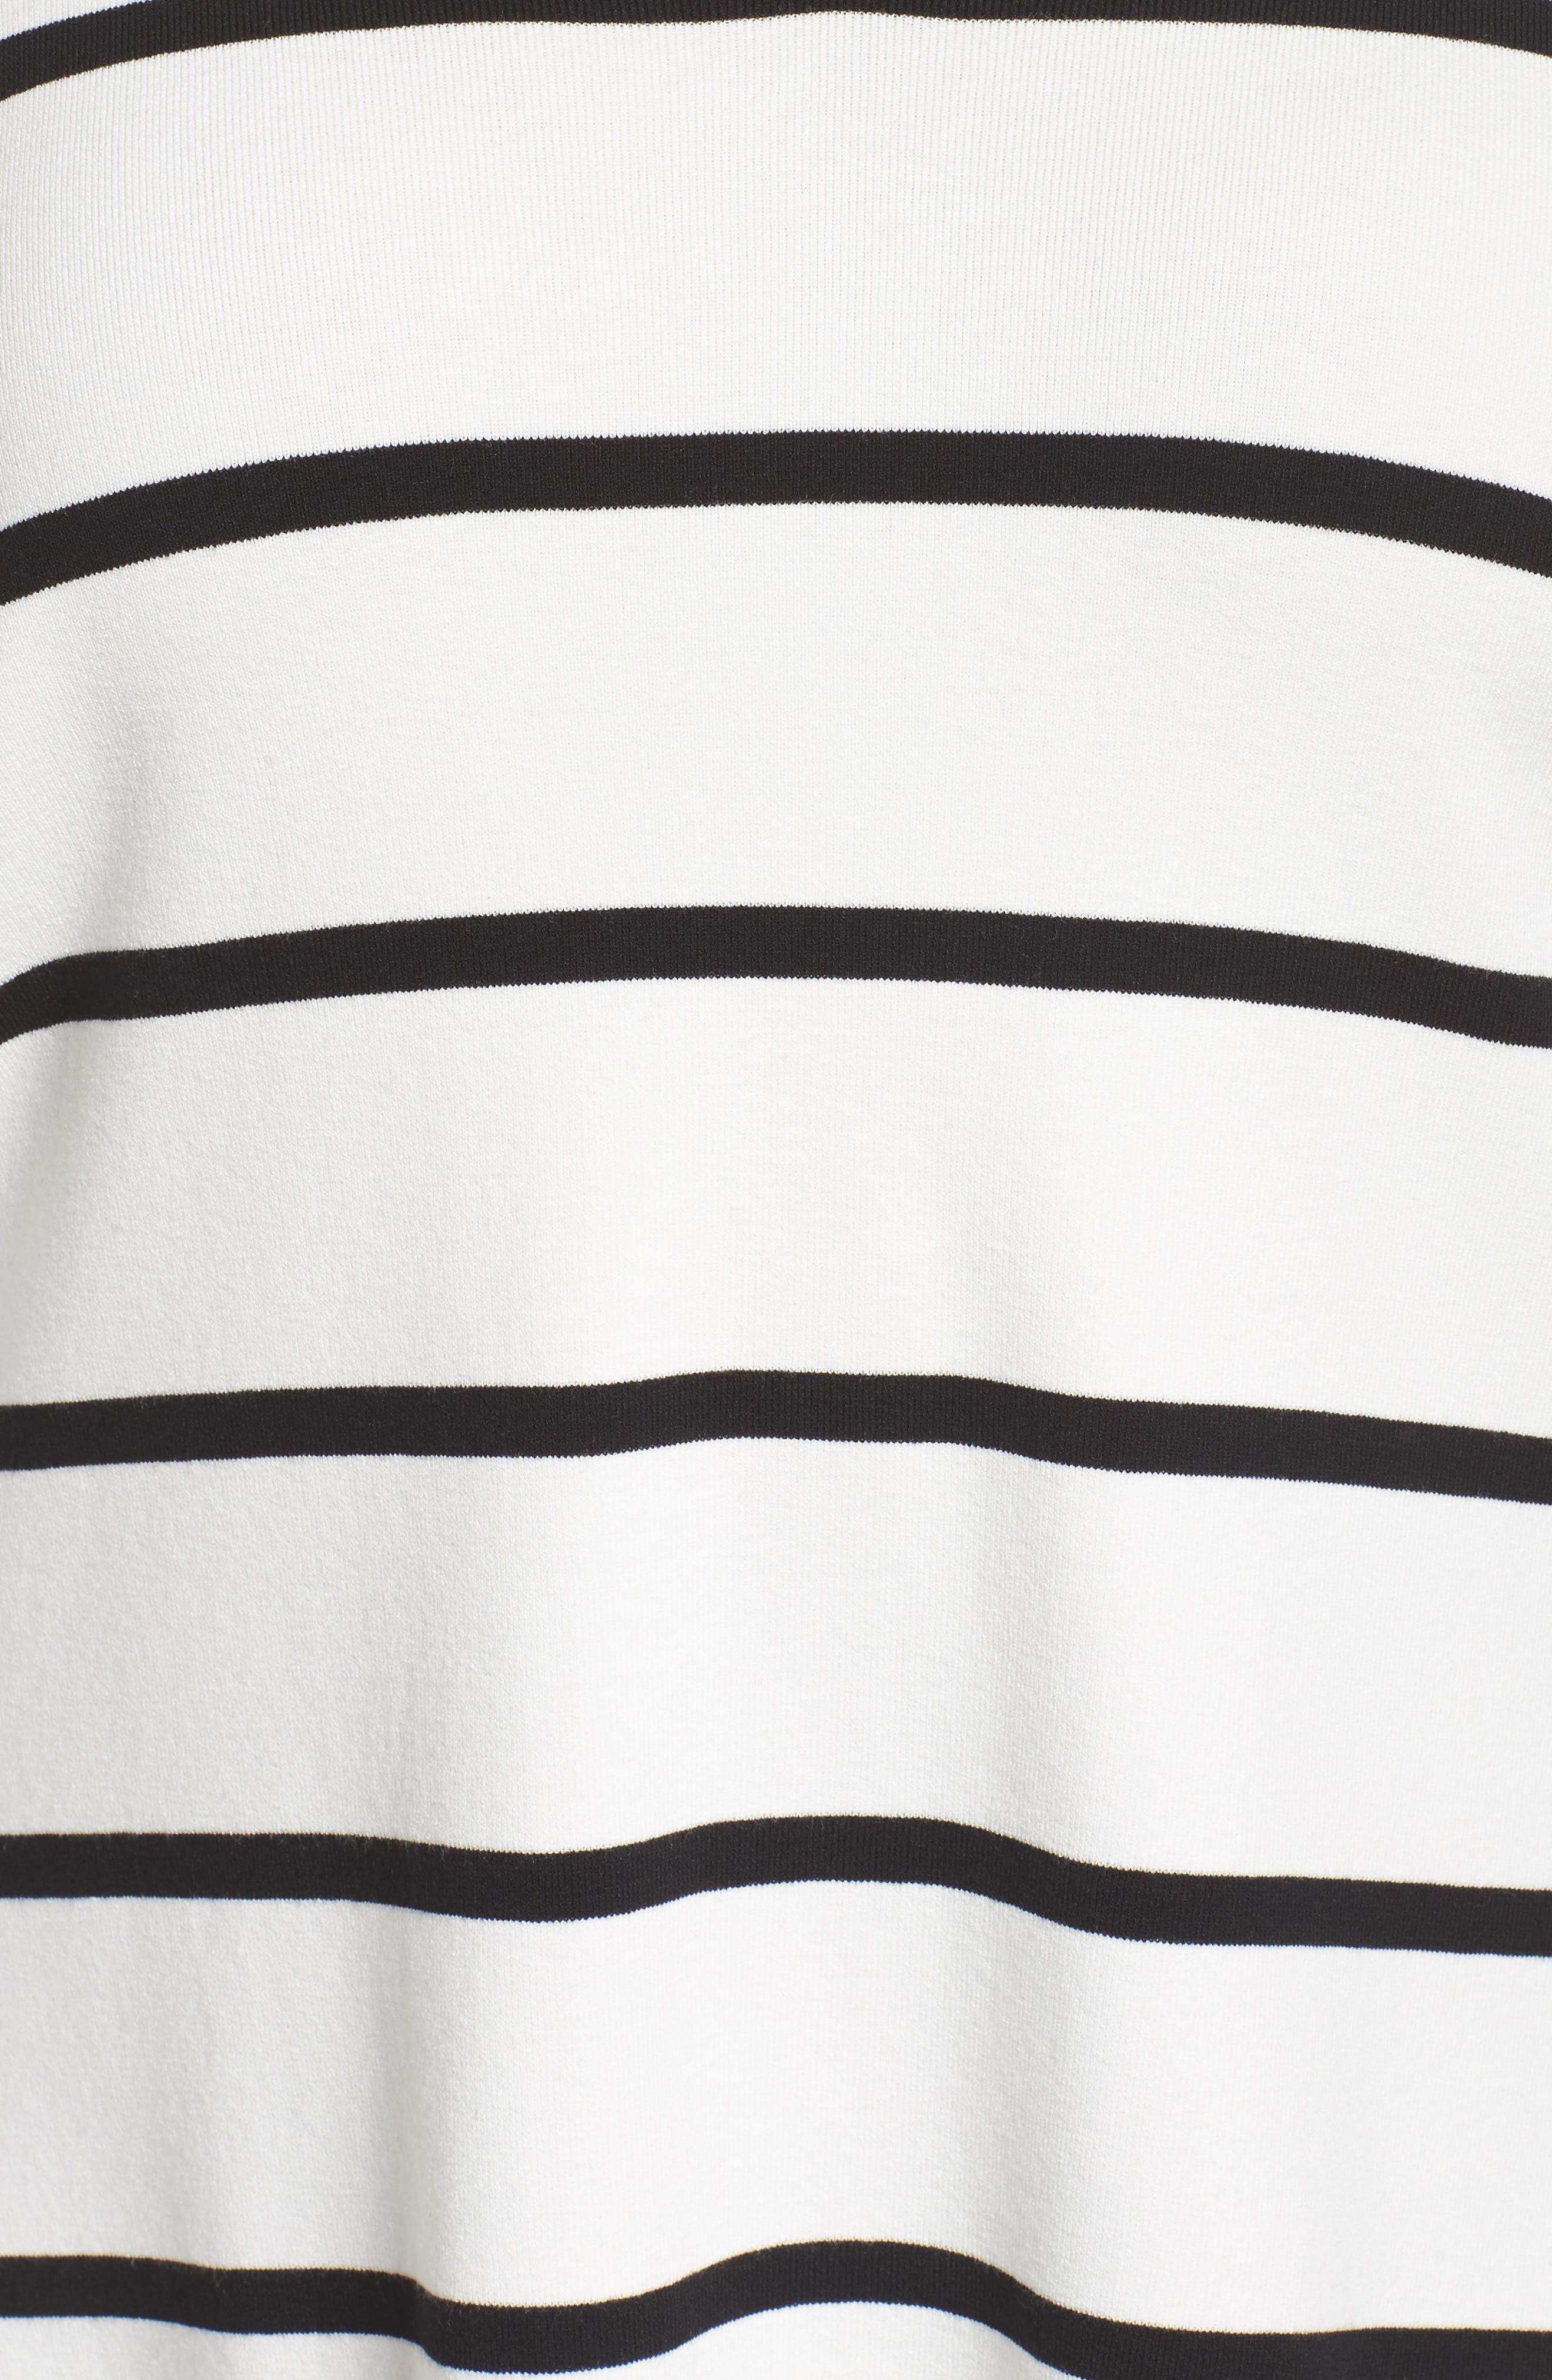 Stripe Sweater,                             Alternate thumbnail 5, color,                             141